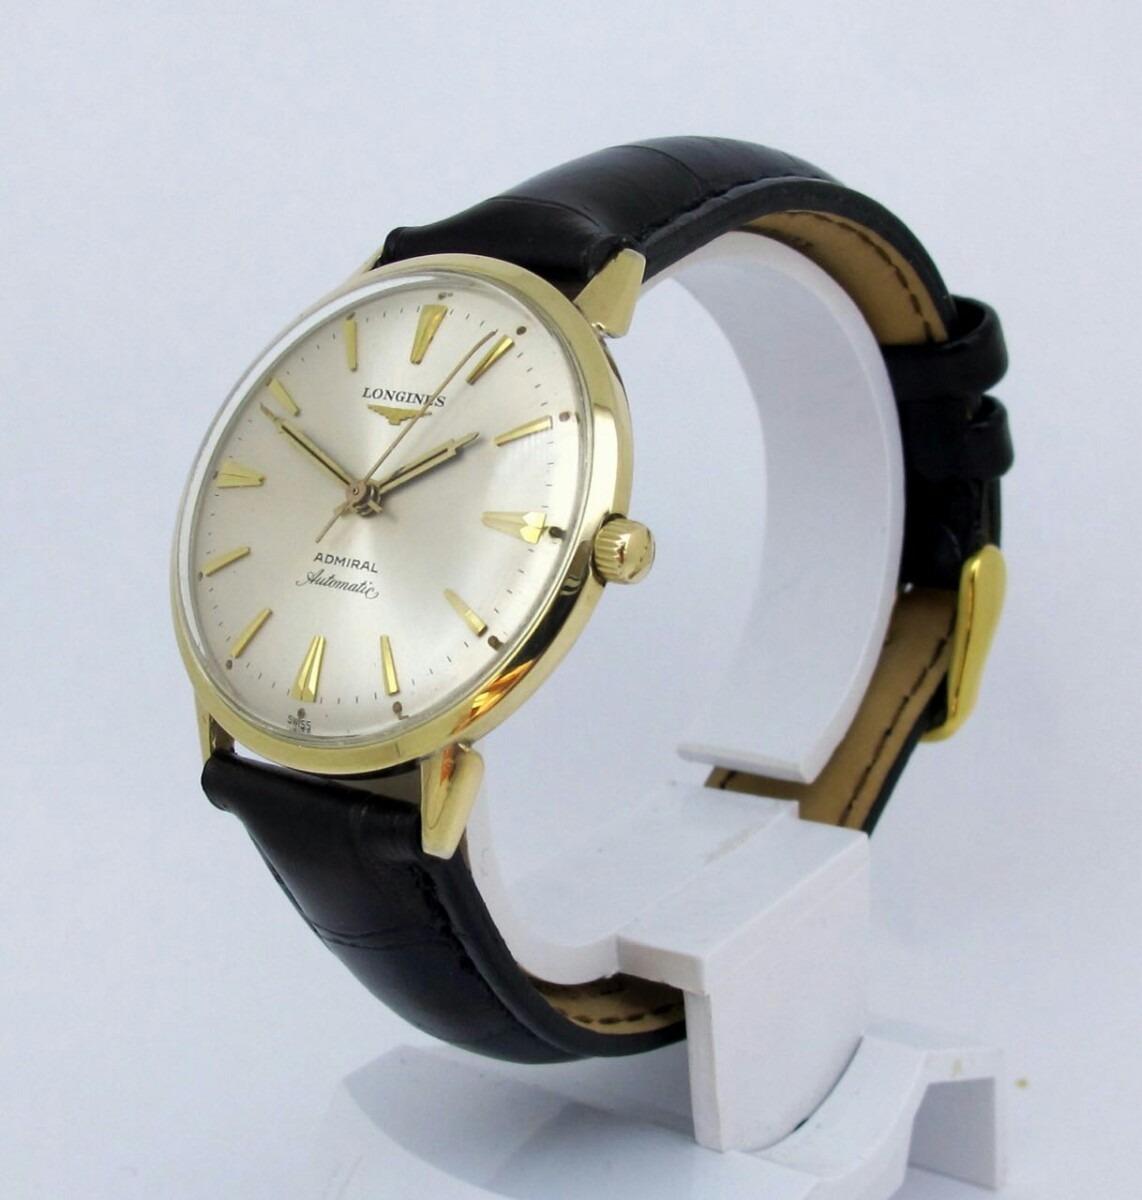 b80c860cdad Relógio Longines Admiral Década De 60 70 - R  2.890